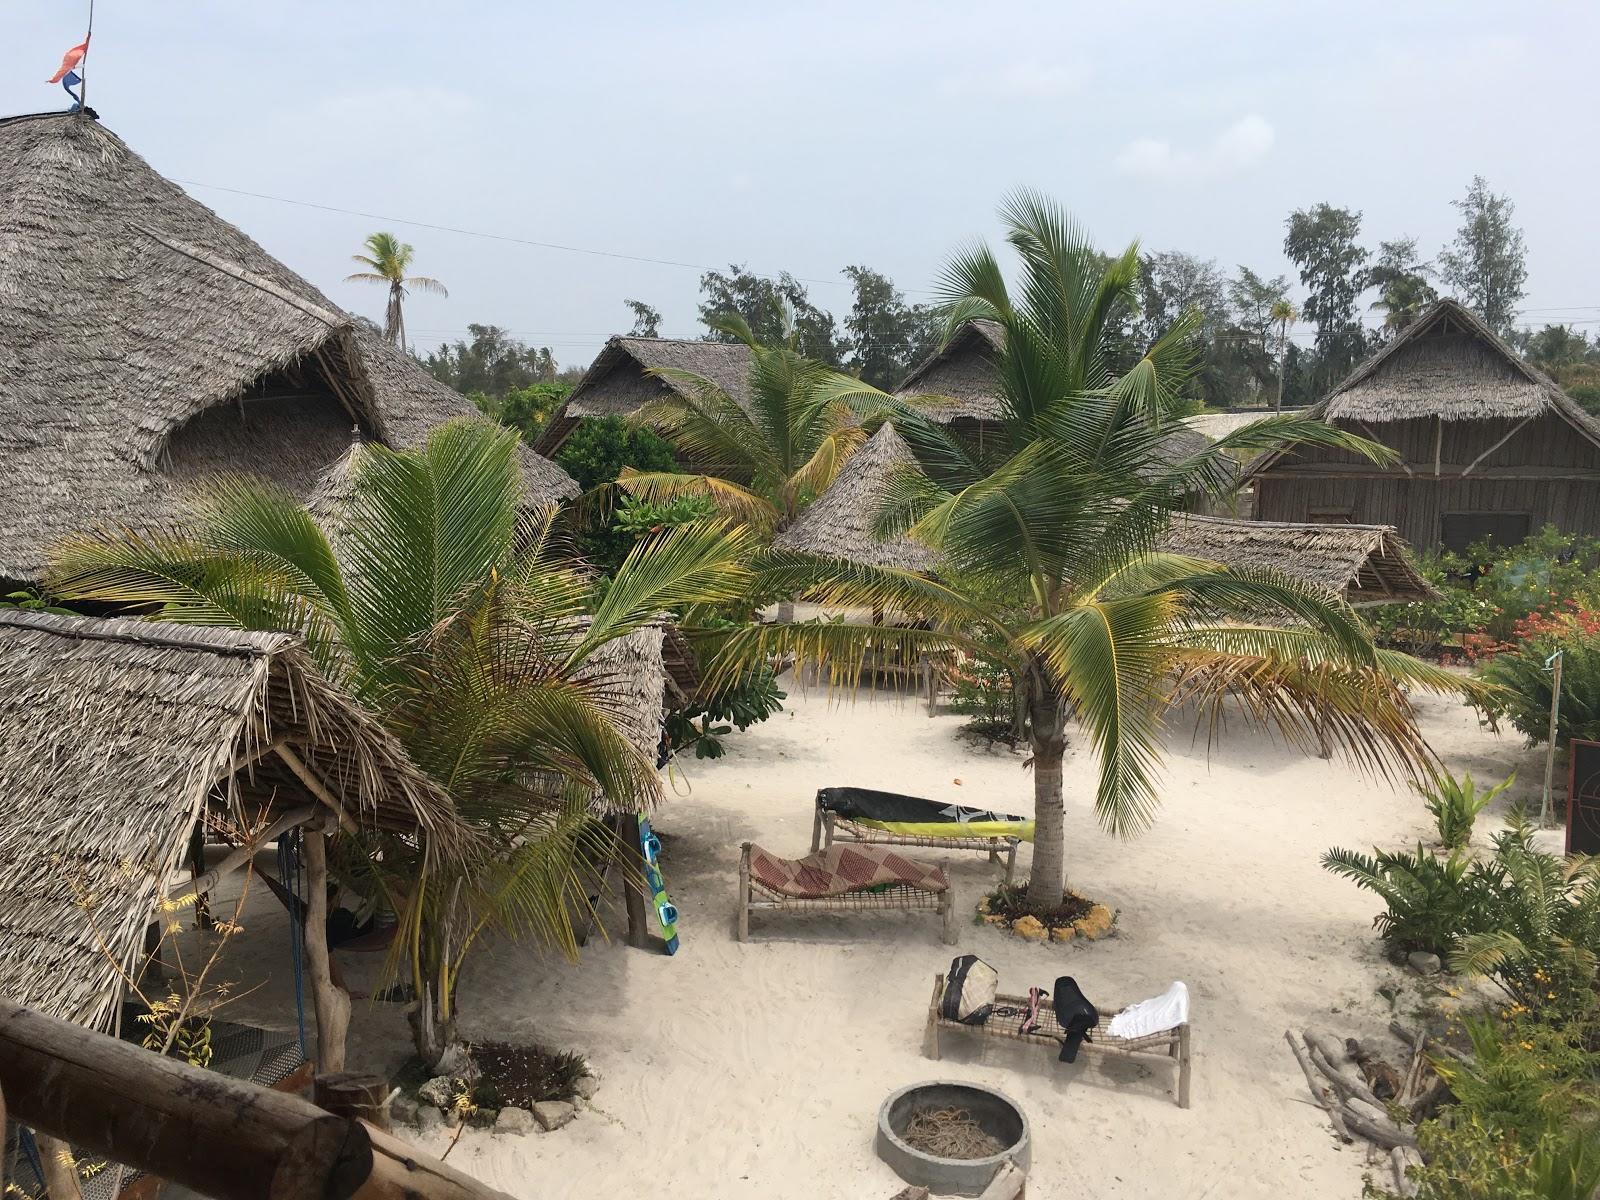 Ubytovanie Summer Dream Lodge na pláži Paje, Zanzibar